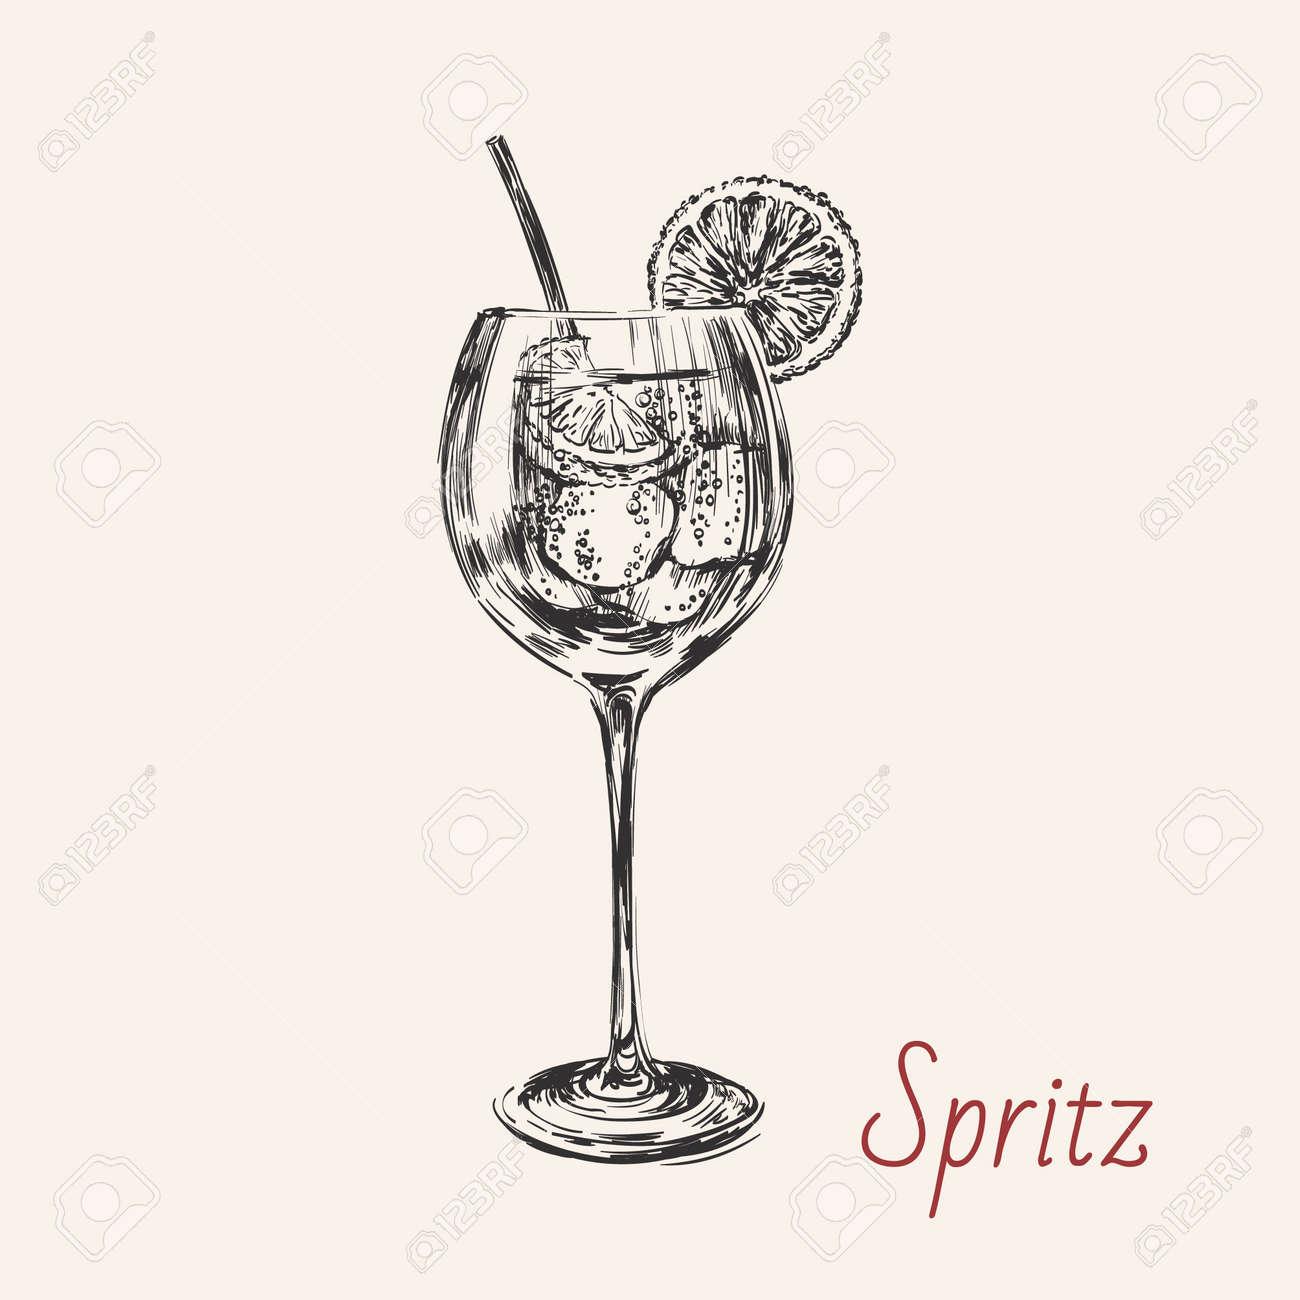 Spritz Hand Drawn Summer Cocktail Drink Vector Illustration. - 171942673